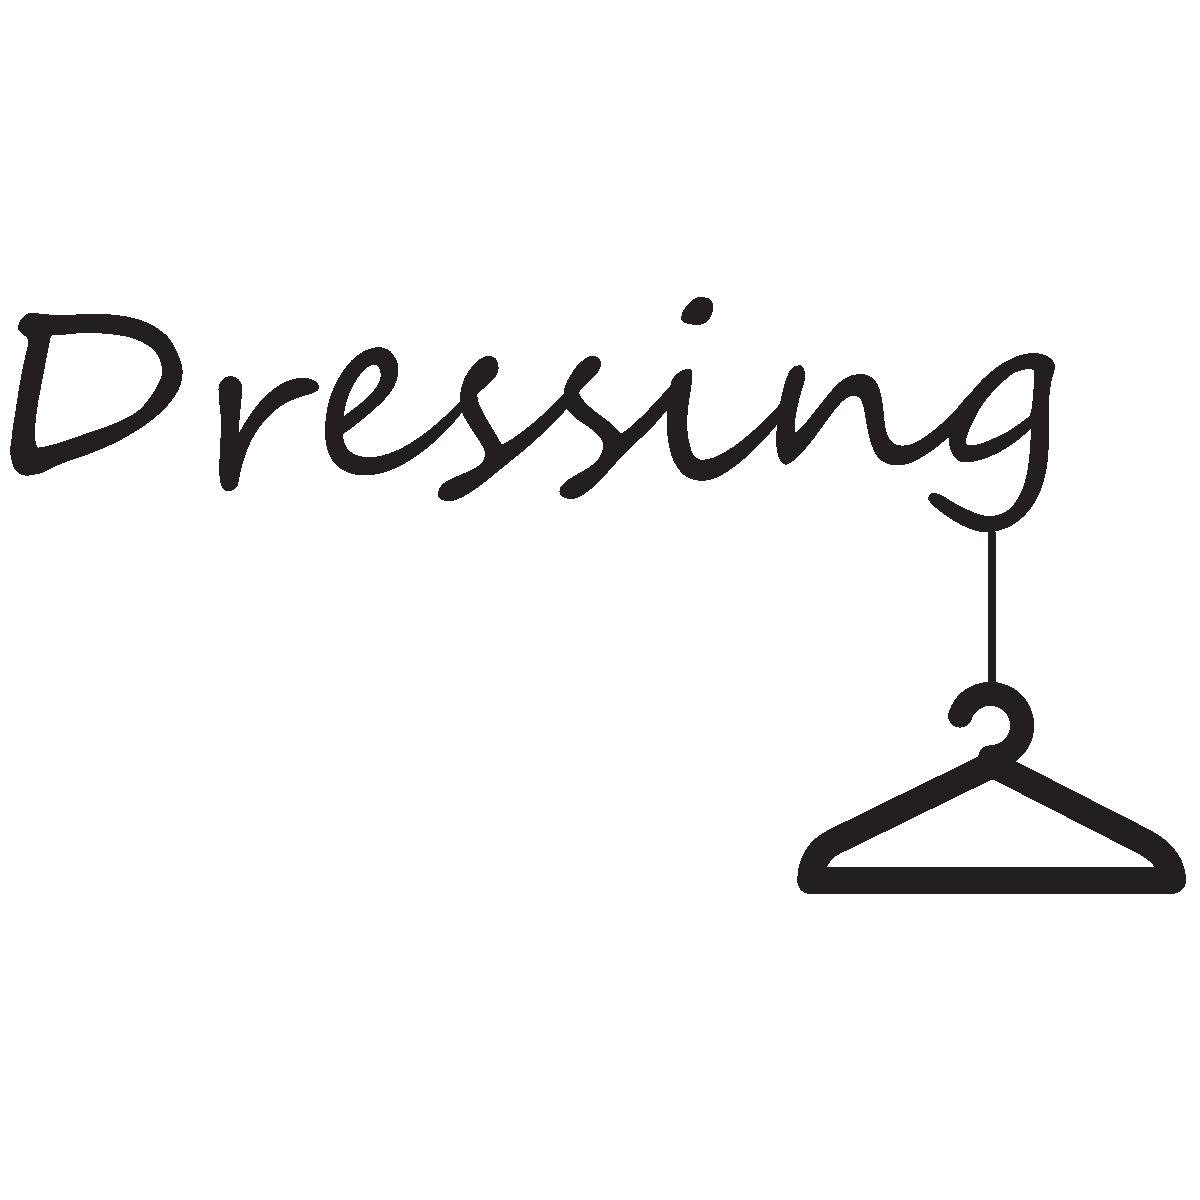 sticker pour porte dressing stickers chambre texte. Black Bedroom Furniture Sets. Home Design Ideas